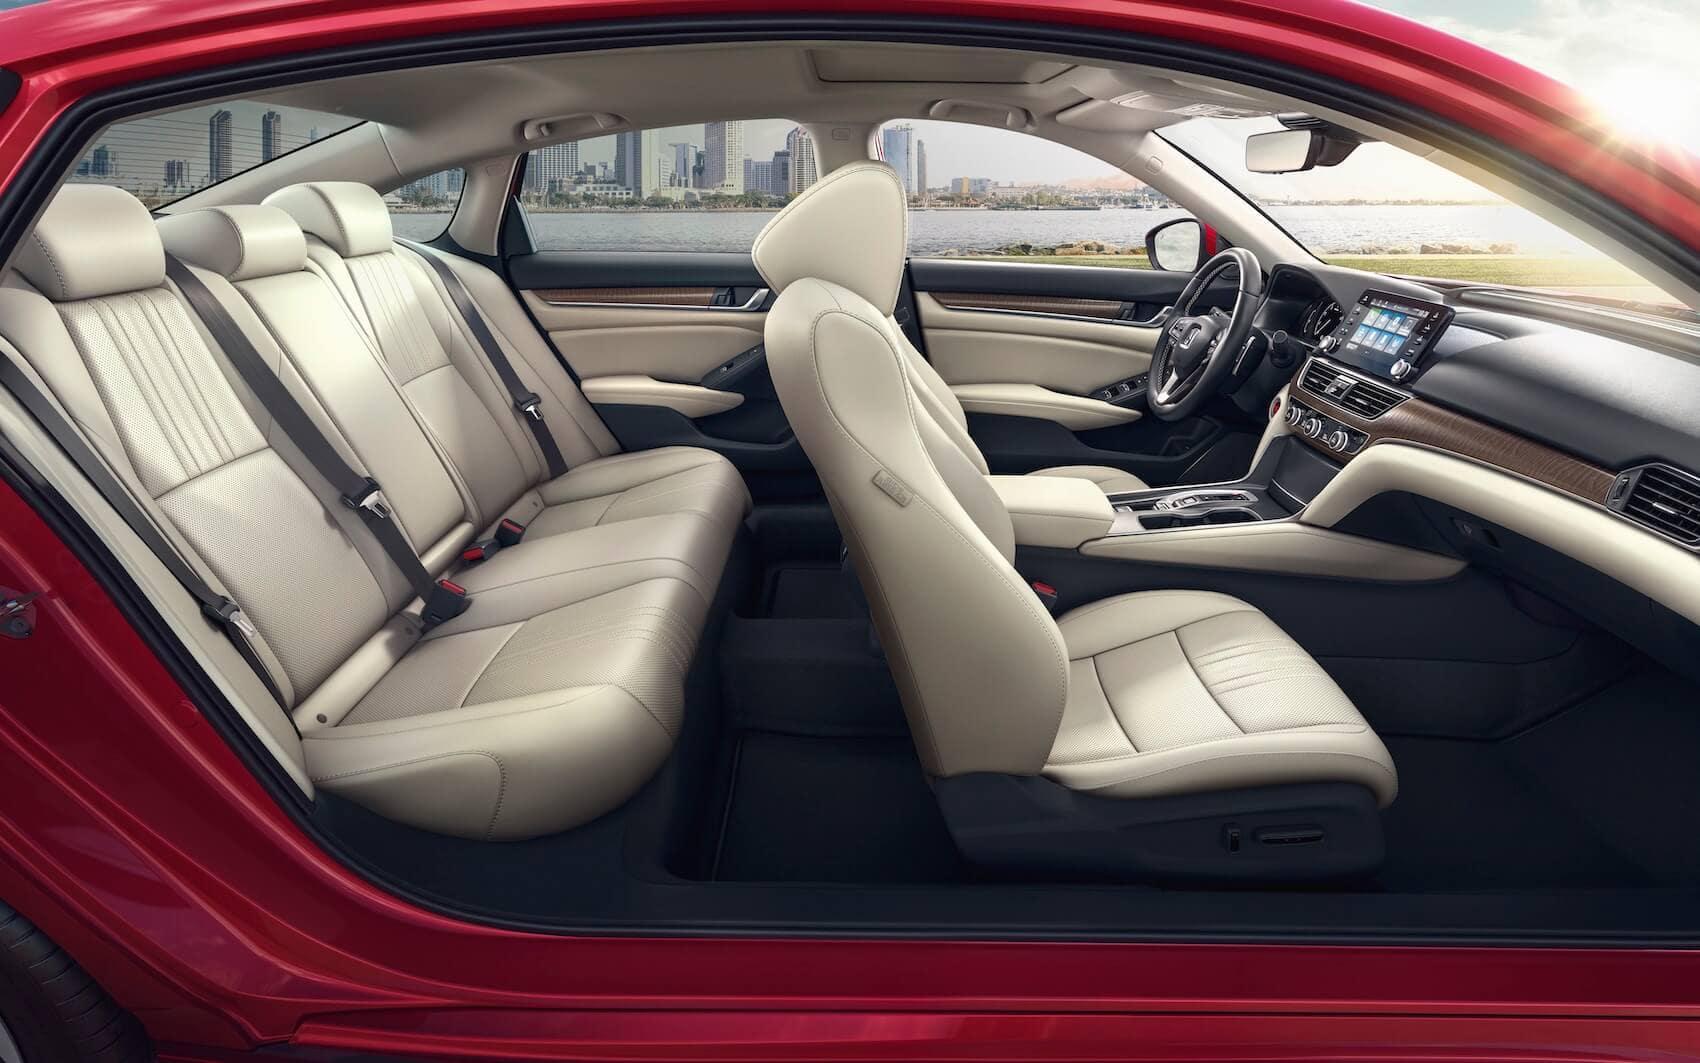 Honda Accord: Interior Space